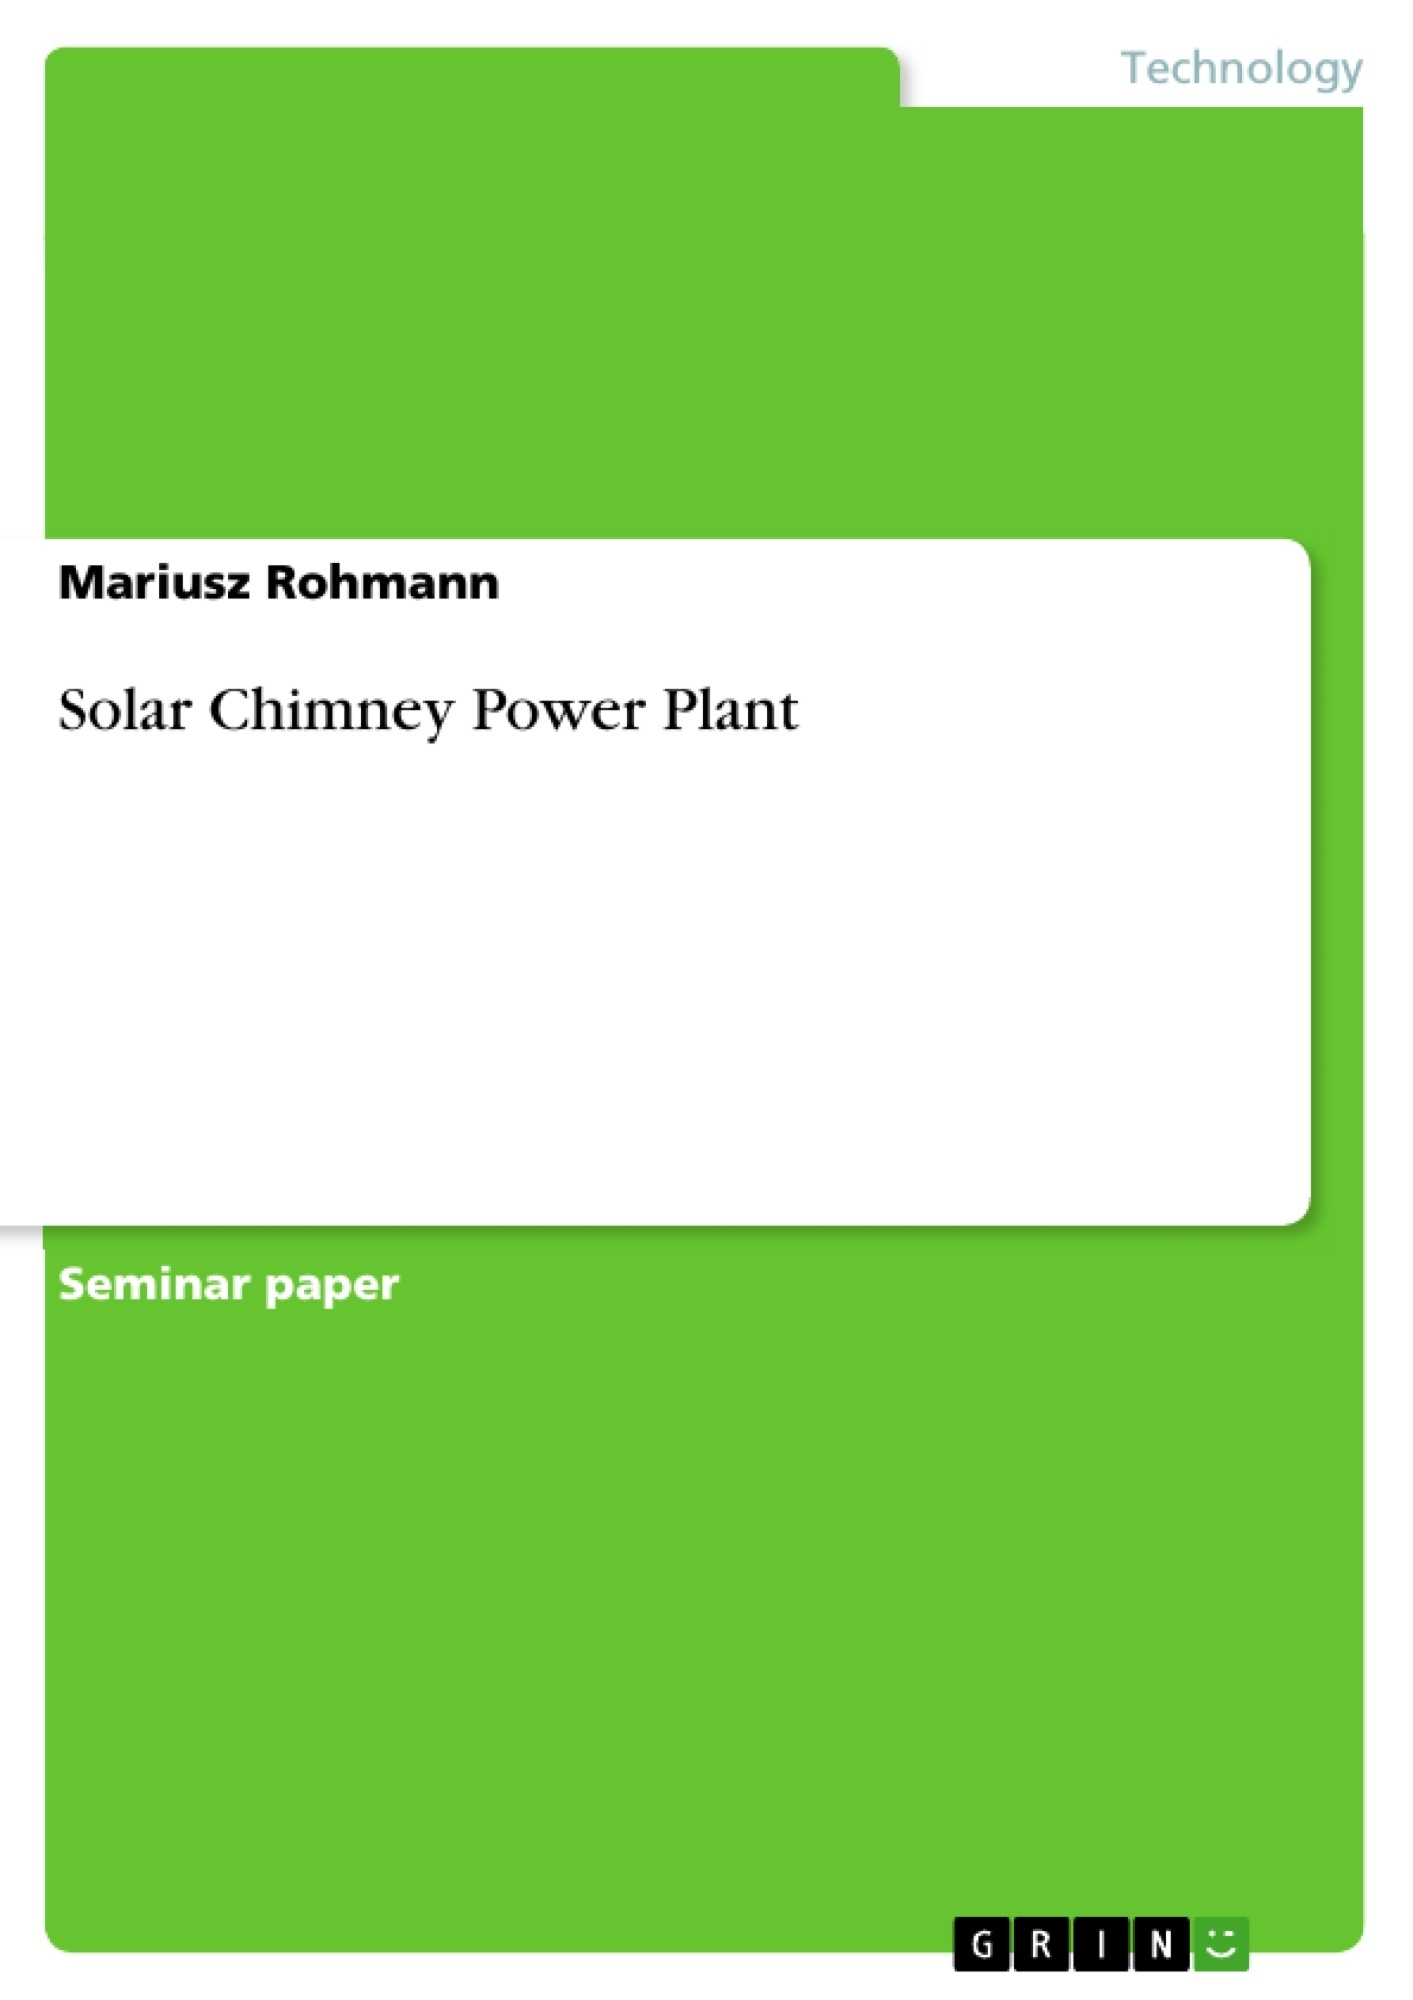 Title: Solar Chimney Power Plant